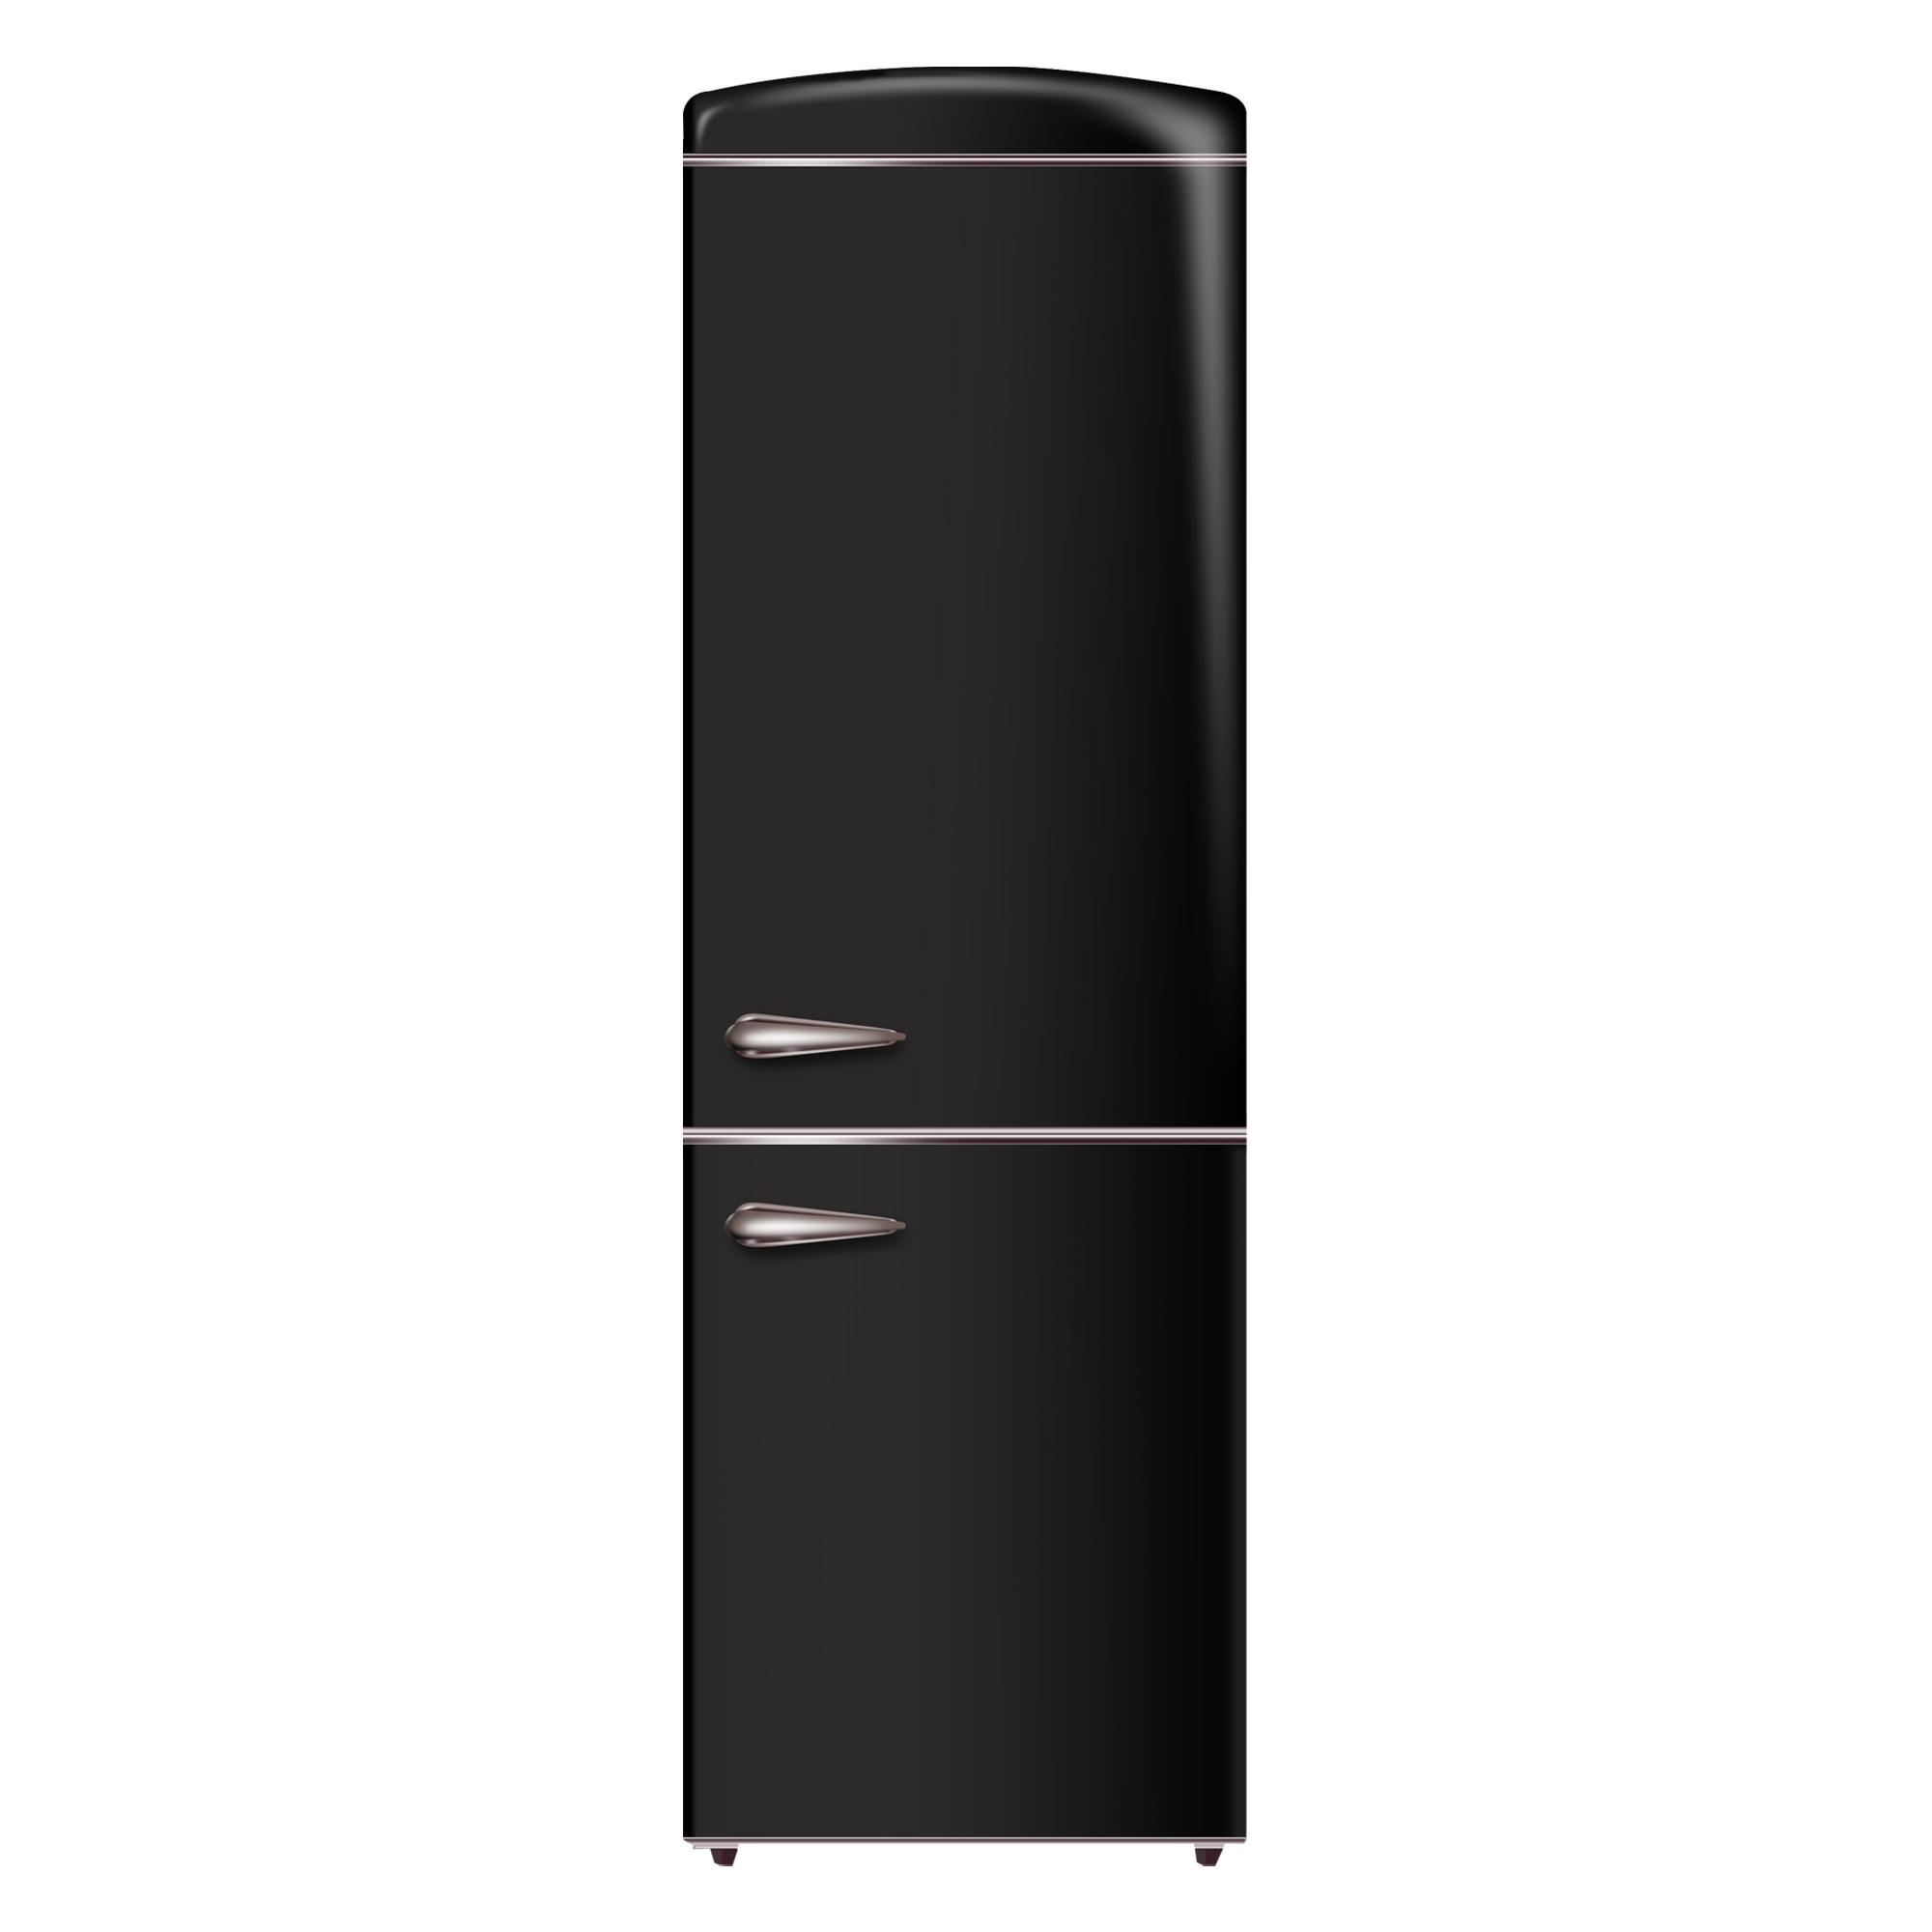 Conserv 10.7 cu. ft. Bottom Mount Retro Refrigerator in Black